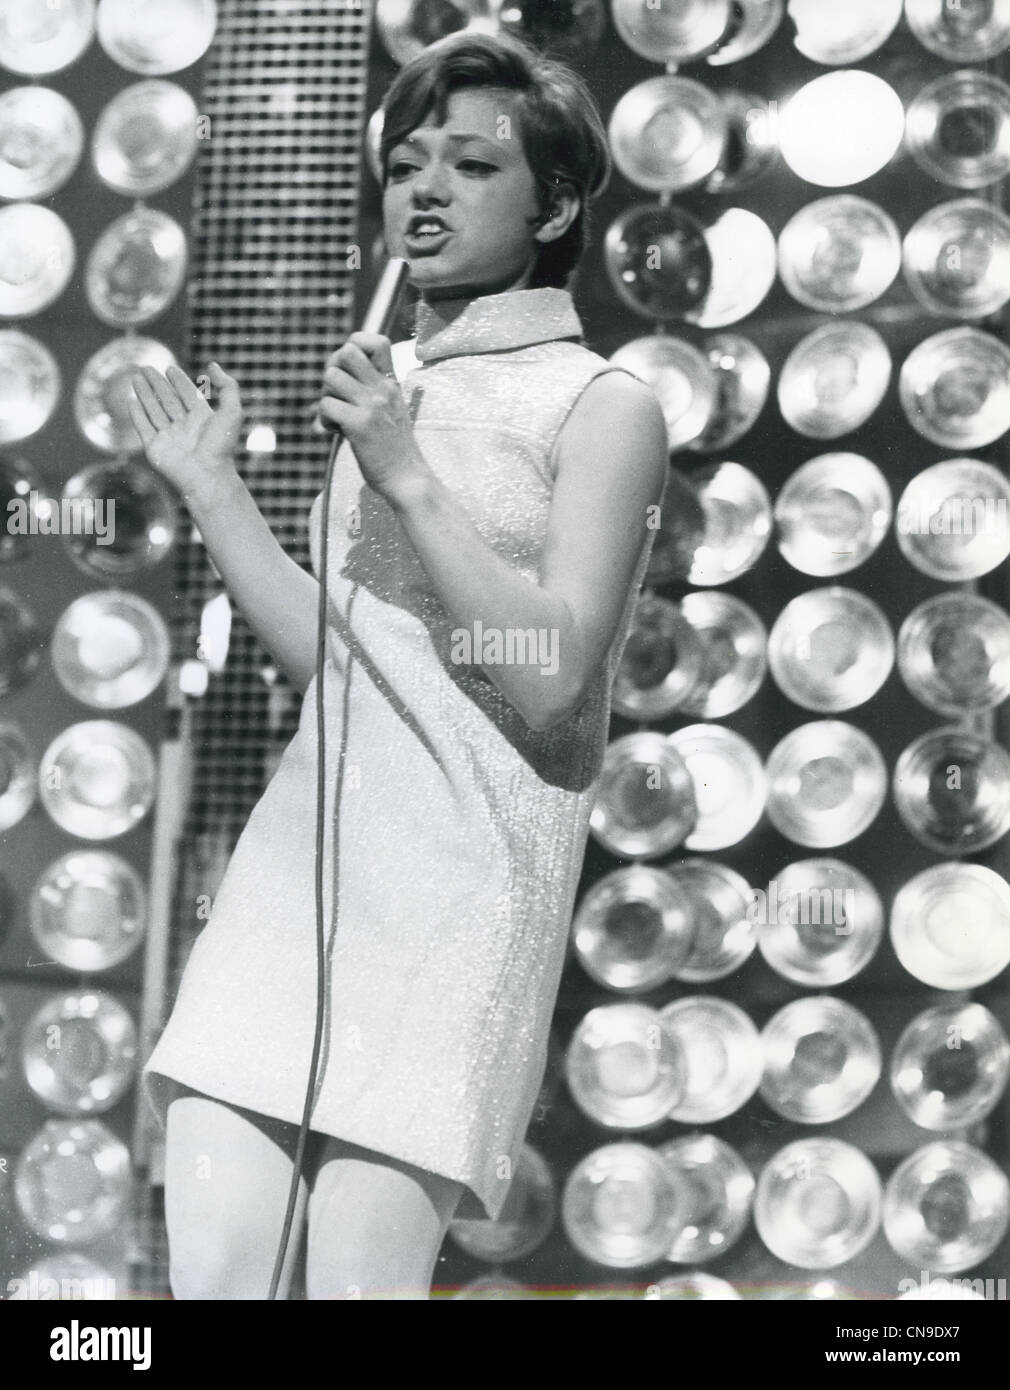 Rita Pavone (born 1945) Rita Pavone (born 1945) new pics